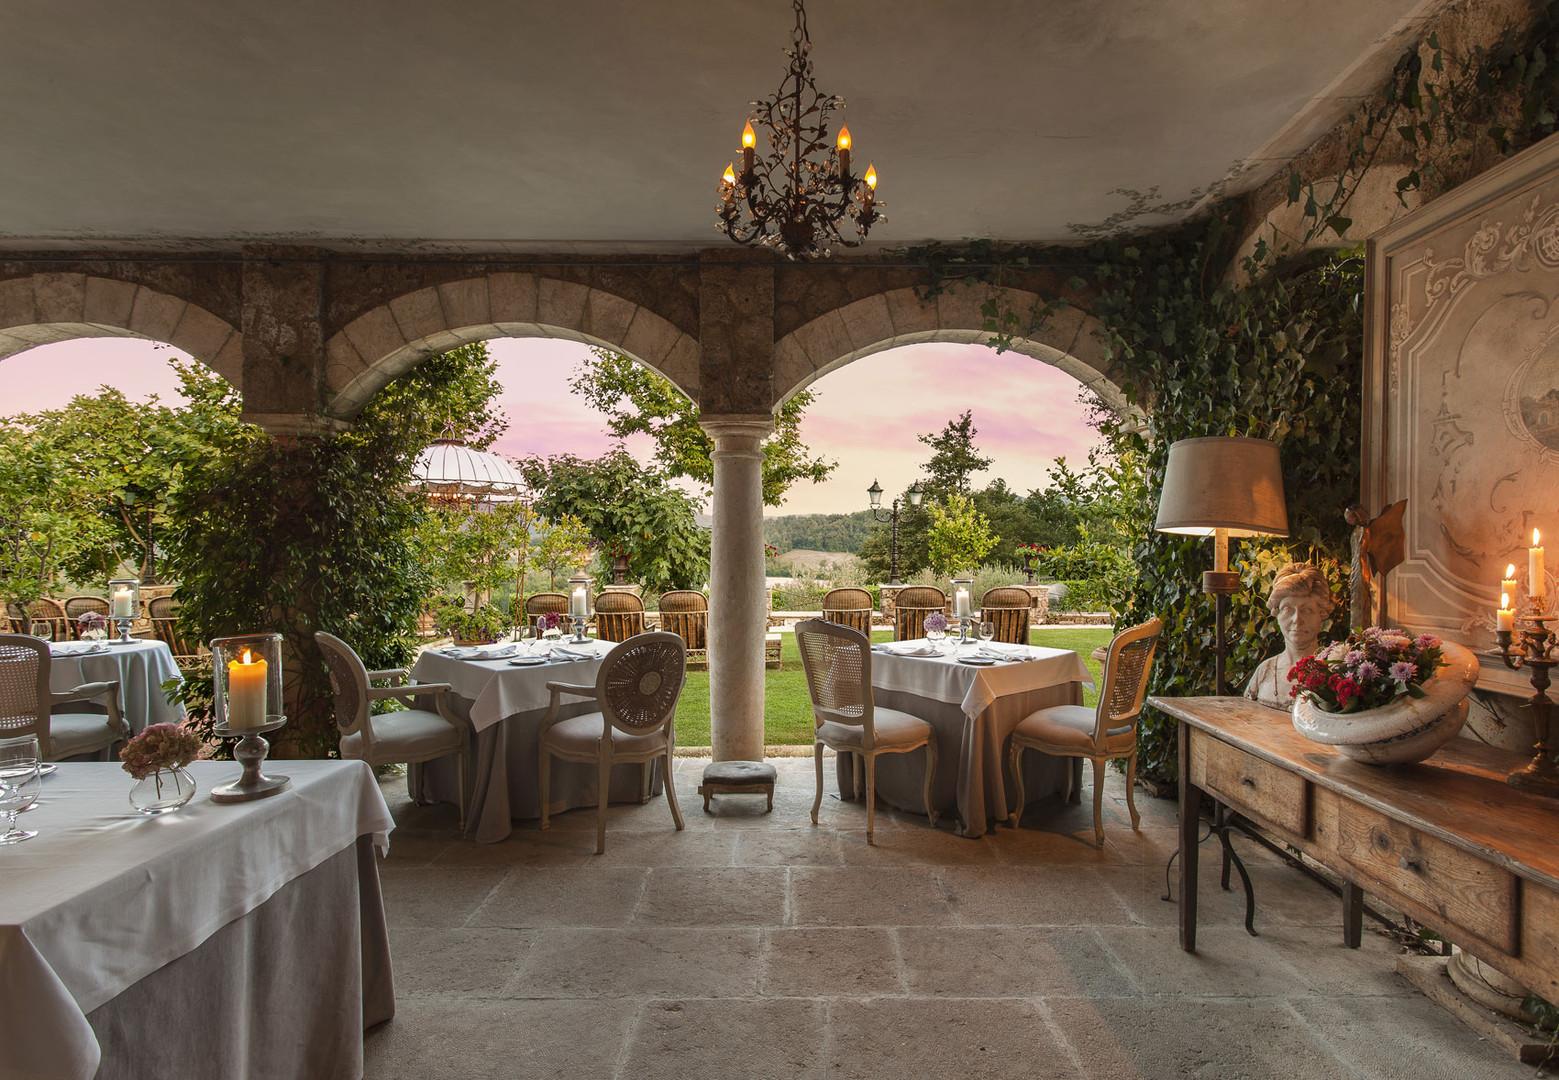 Goumet Hotel Toscana